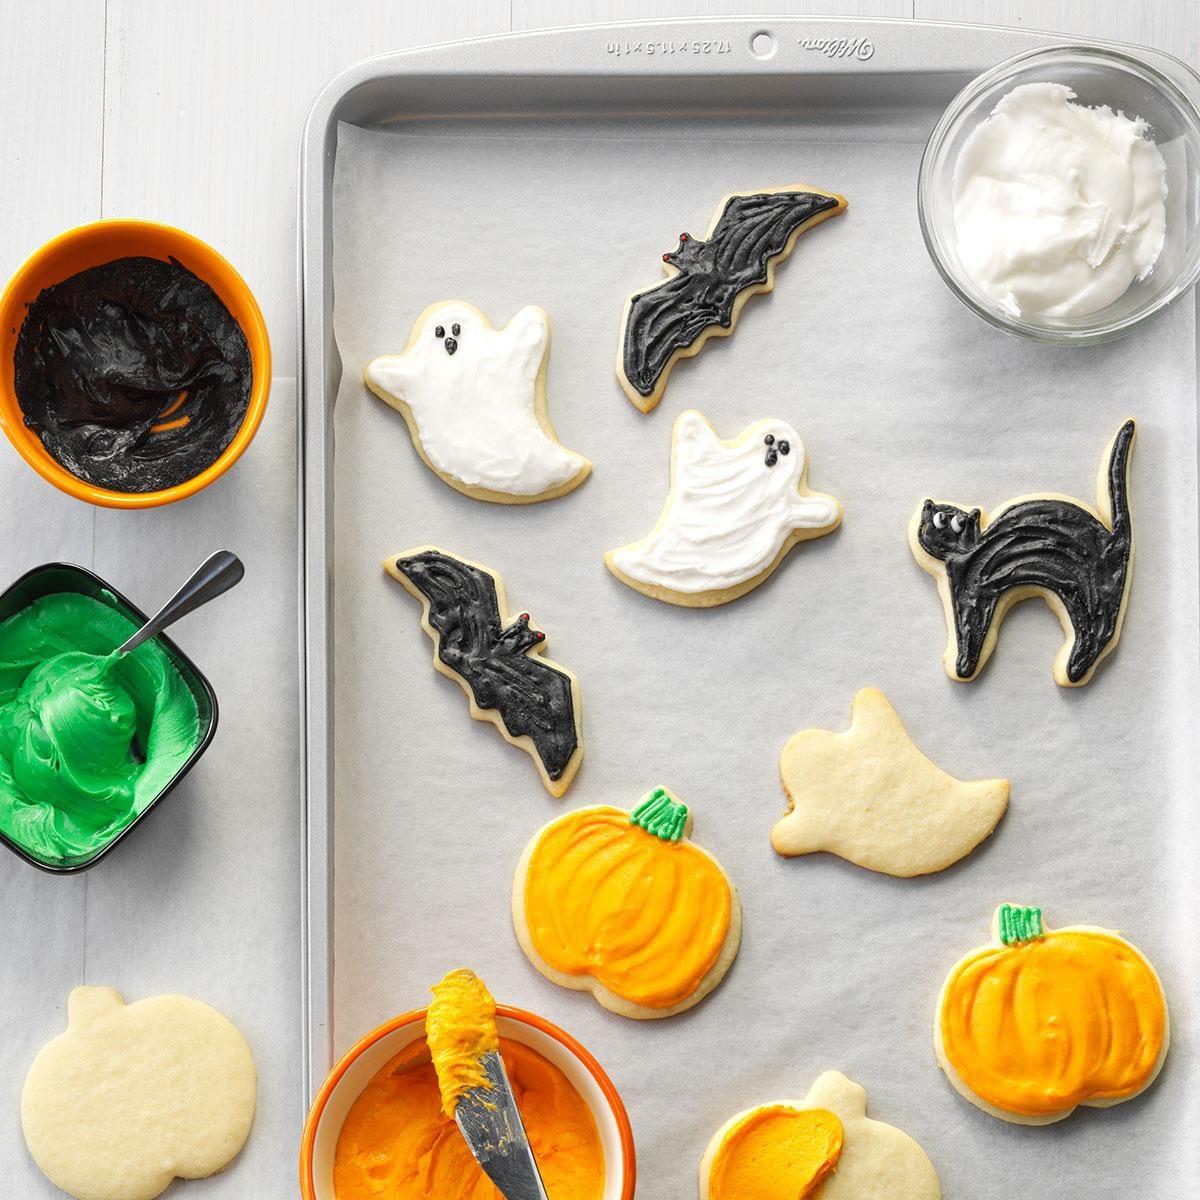 Halloween Pumpkin Cookie Decorating Ideas: Halloween baking ideas ...